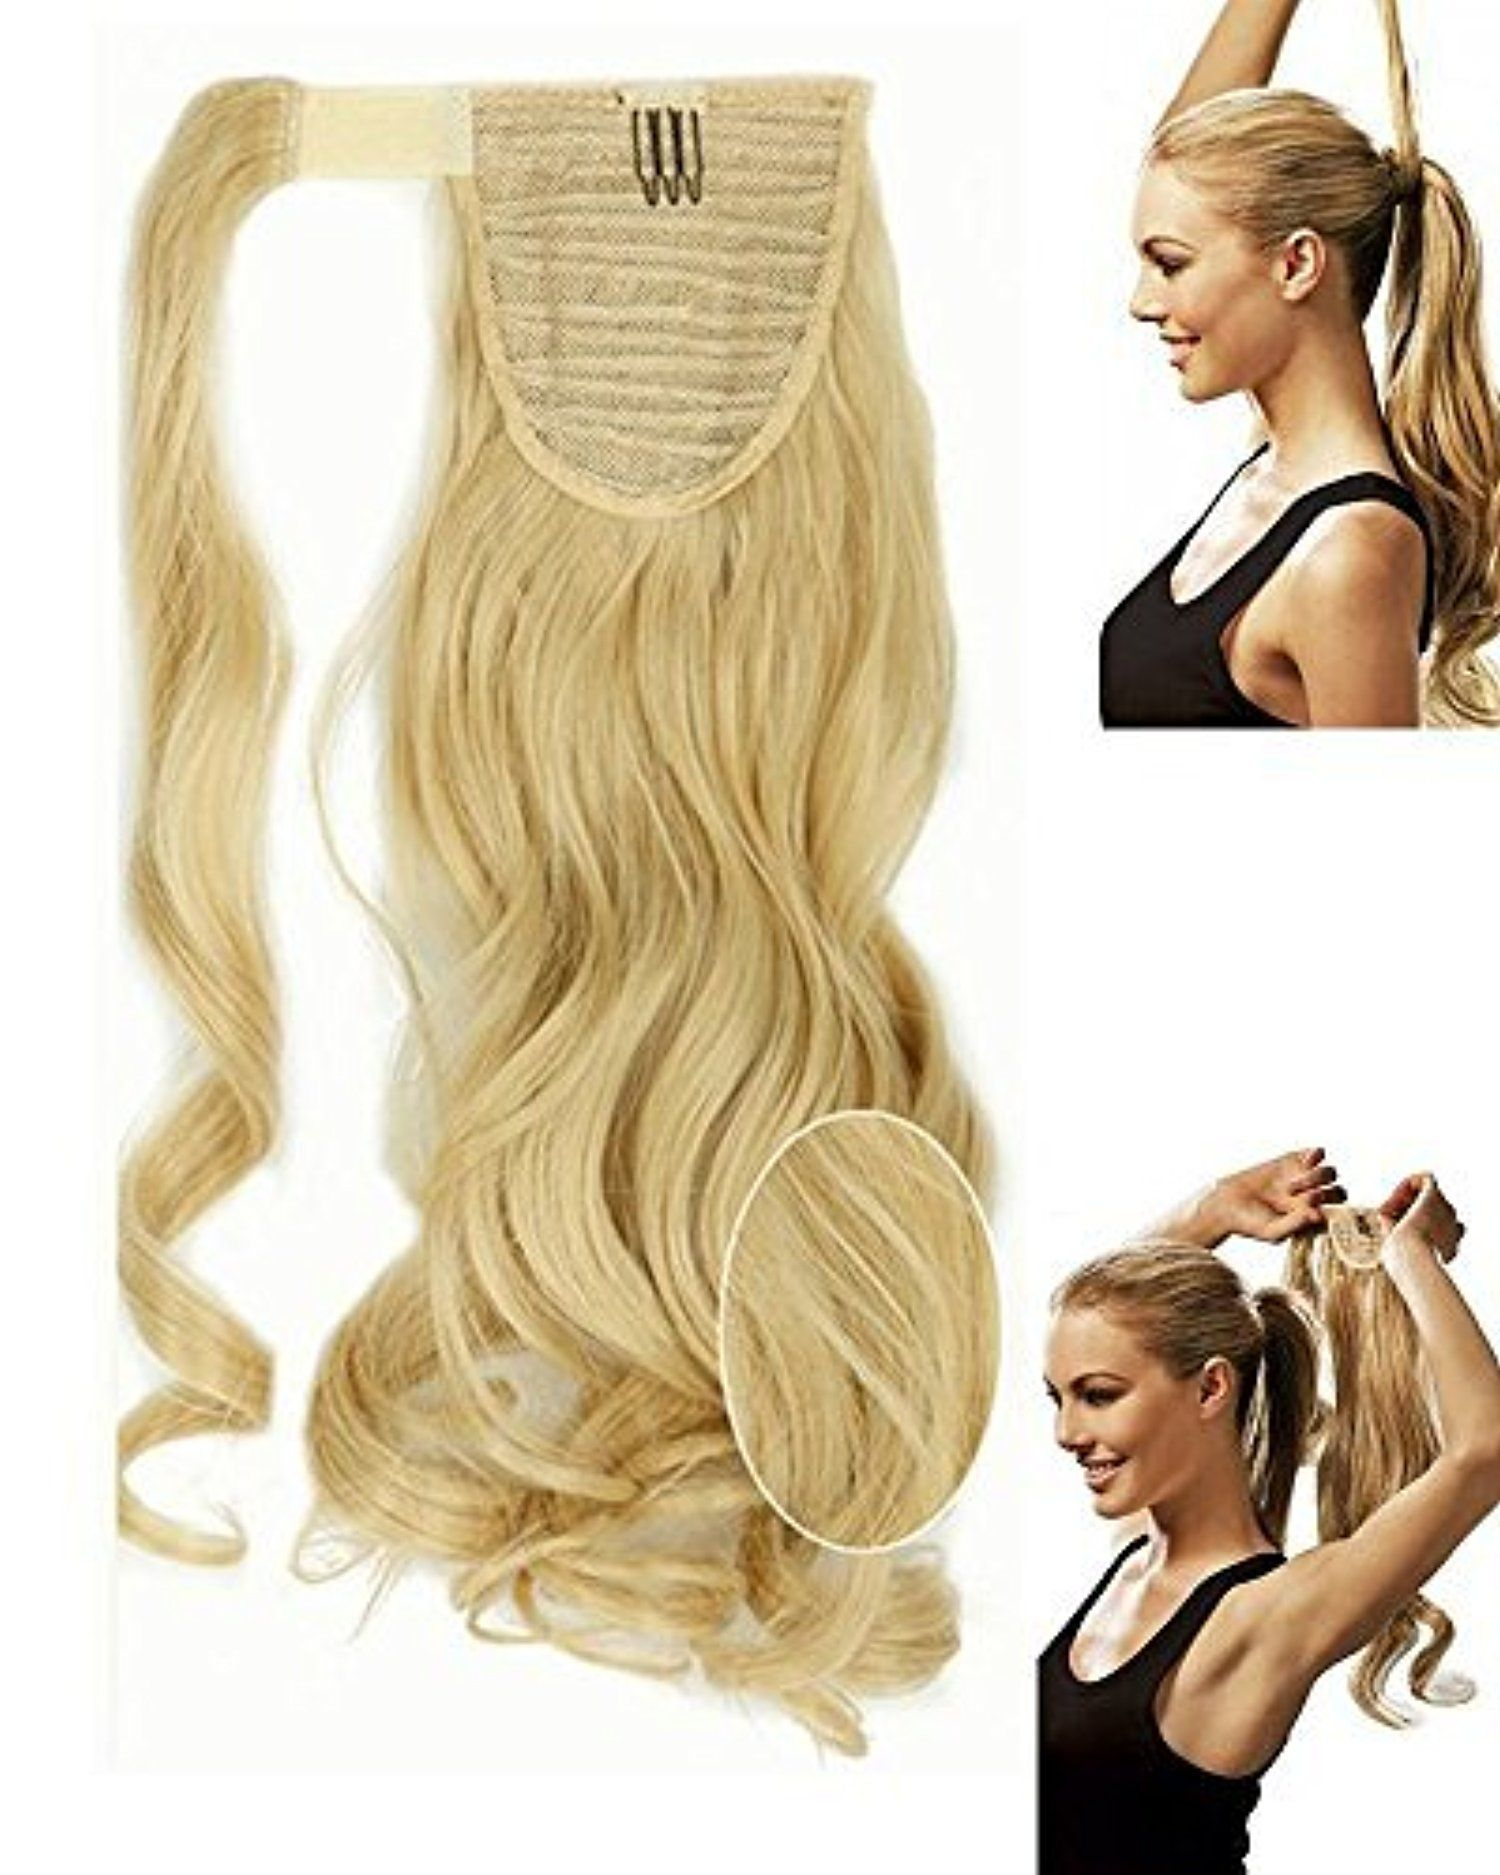 S Noilite 17 Inches Curly Baby Blonde Mix Bleach Blonde Wrap Around